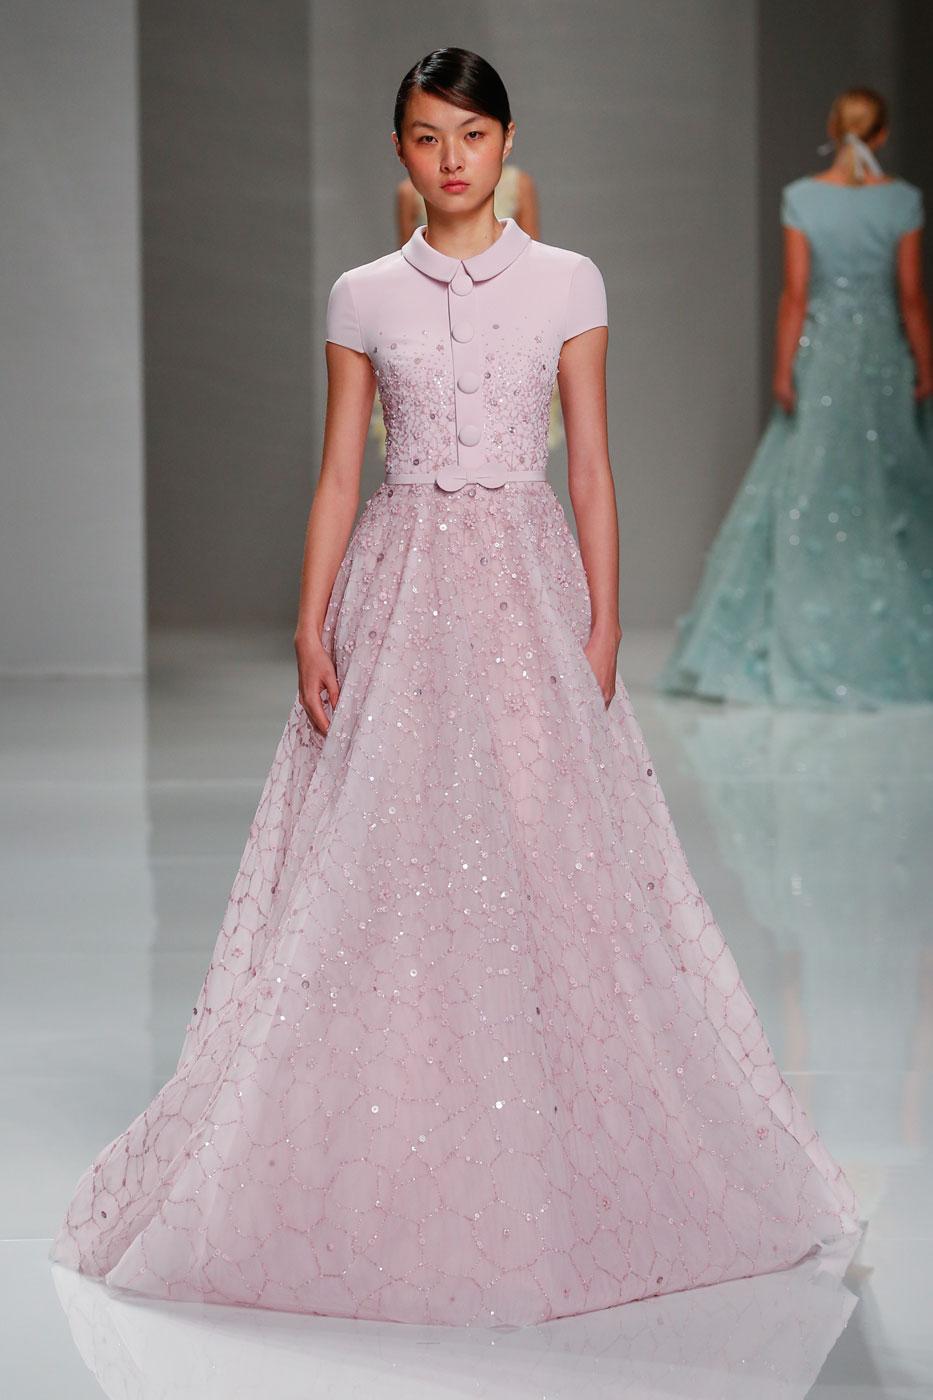 Georges-Hobeika-fashion-runway-show-haute-couture-paris-spring-2015-the-impression-77